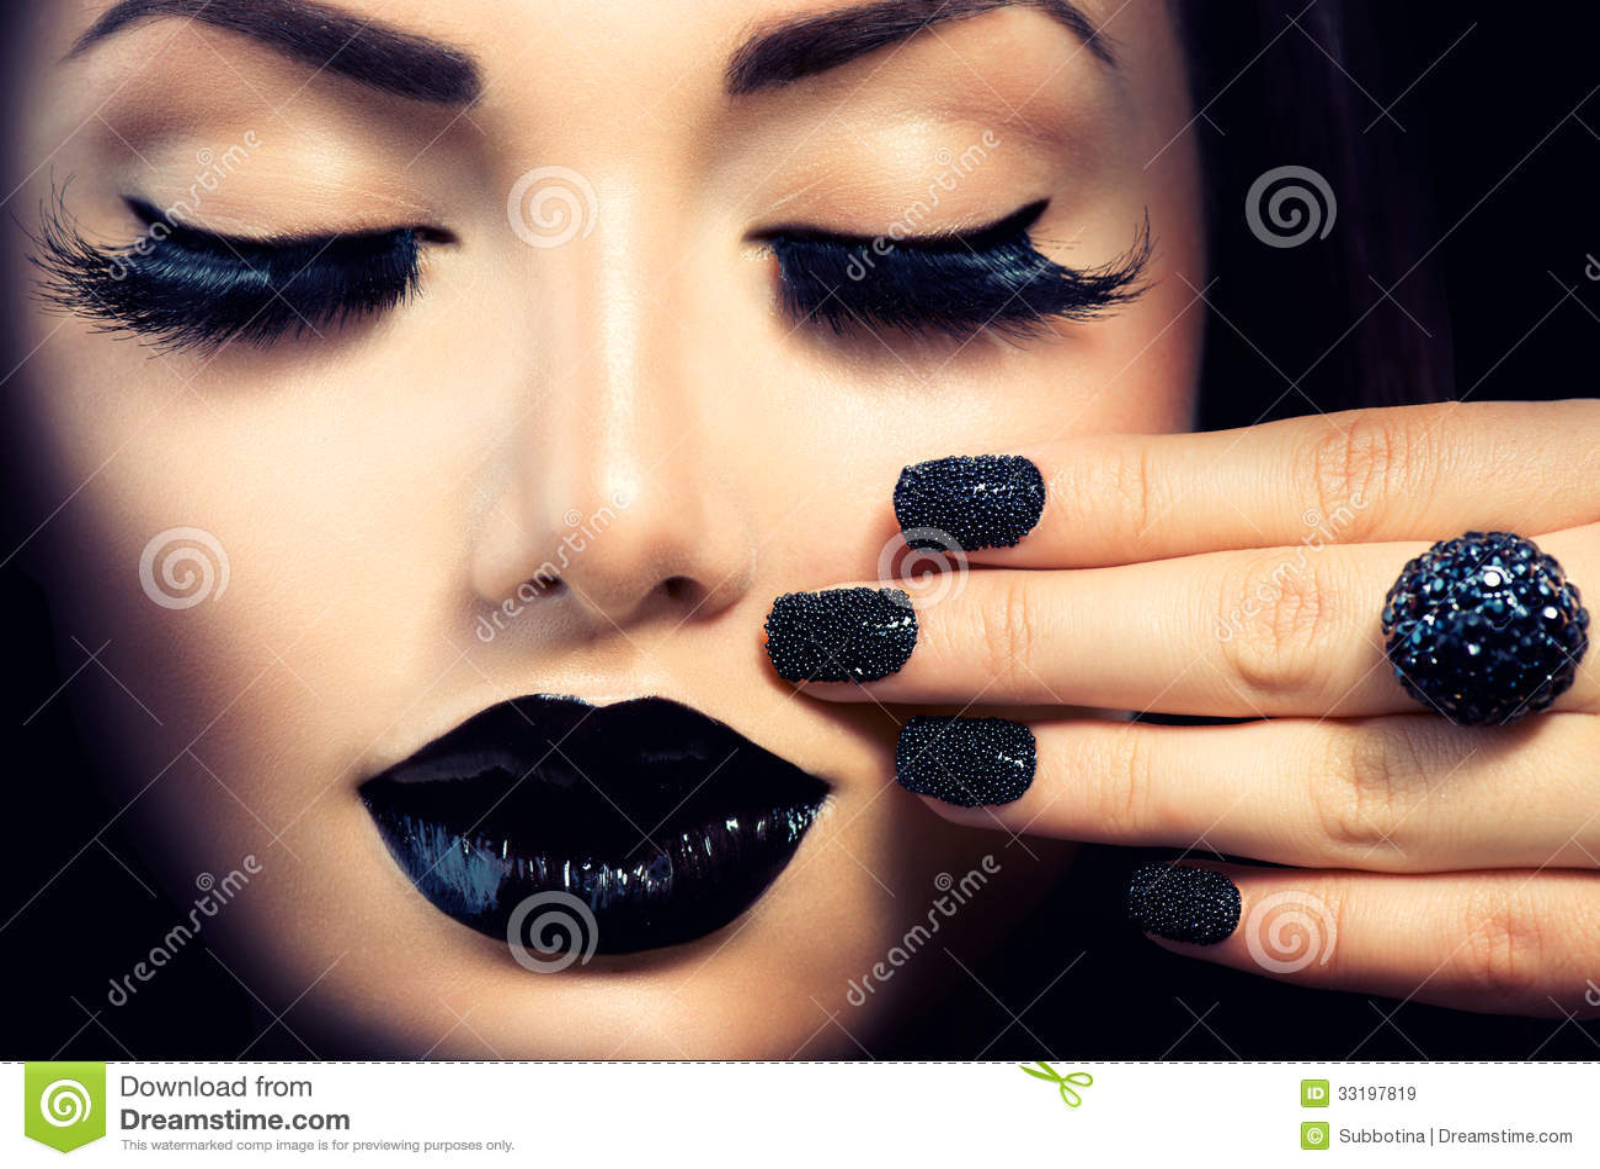 Girl with Caviar Black Manicure